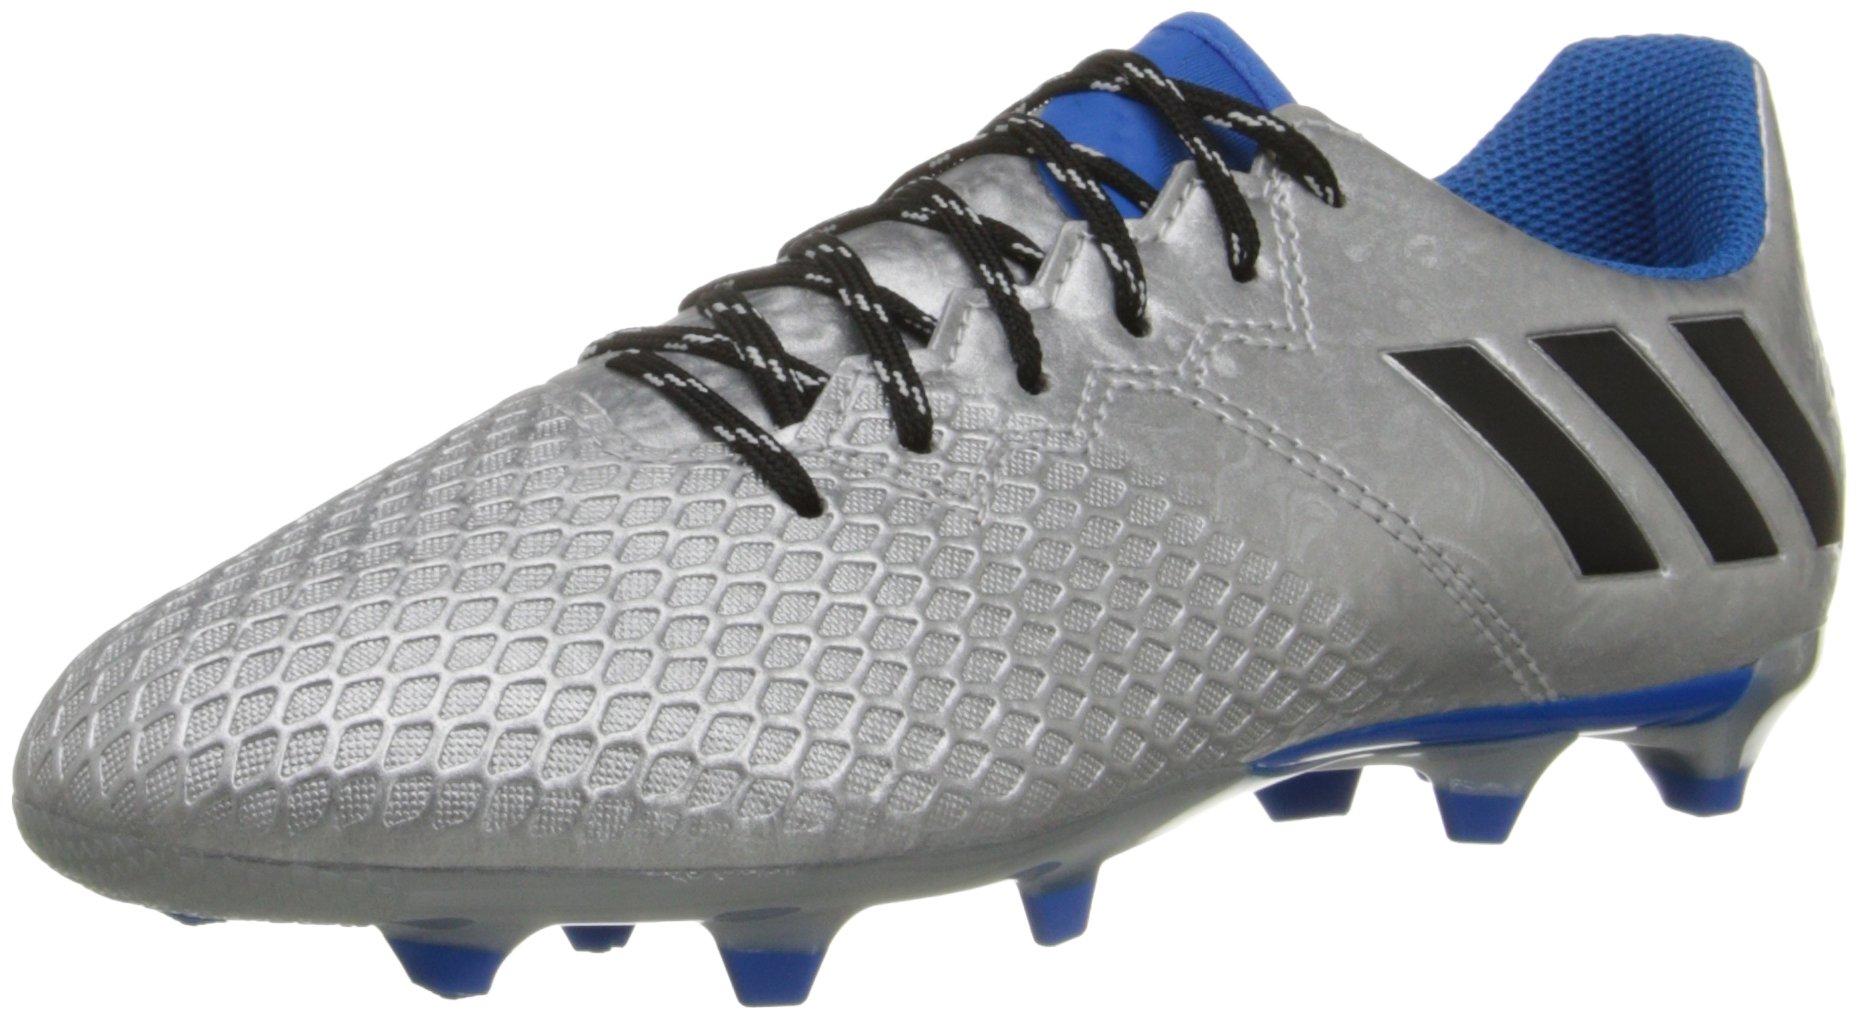 59587dfd4 Galleon - Adidas Performance Kids  Messi 16.3 Firm Ground Soccer Shoe  (Little Kid Big Kid)